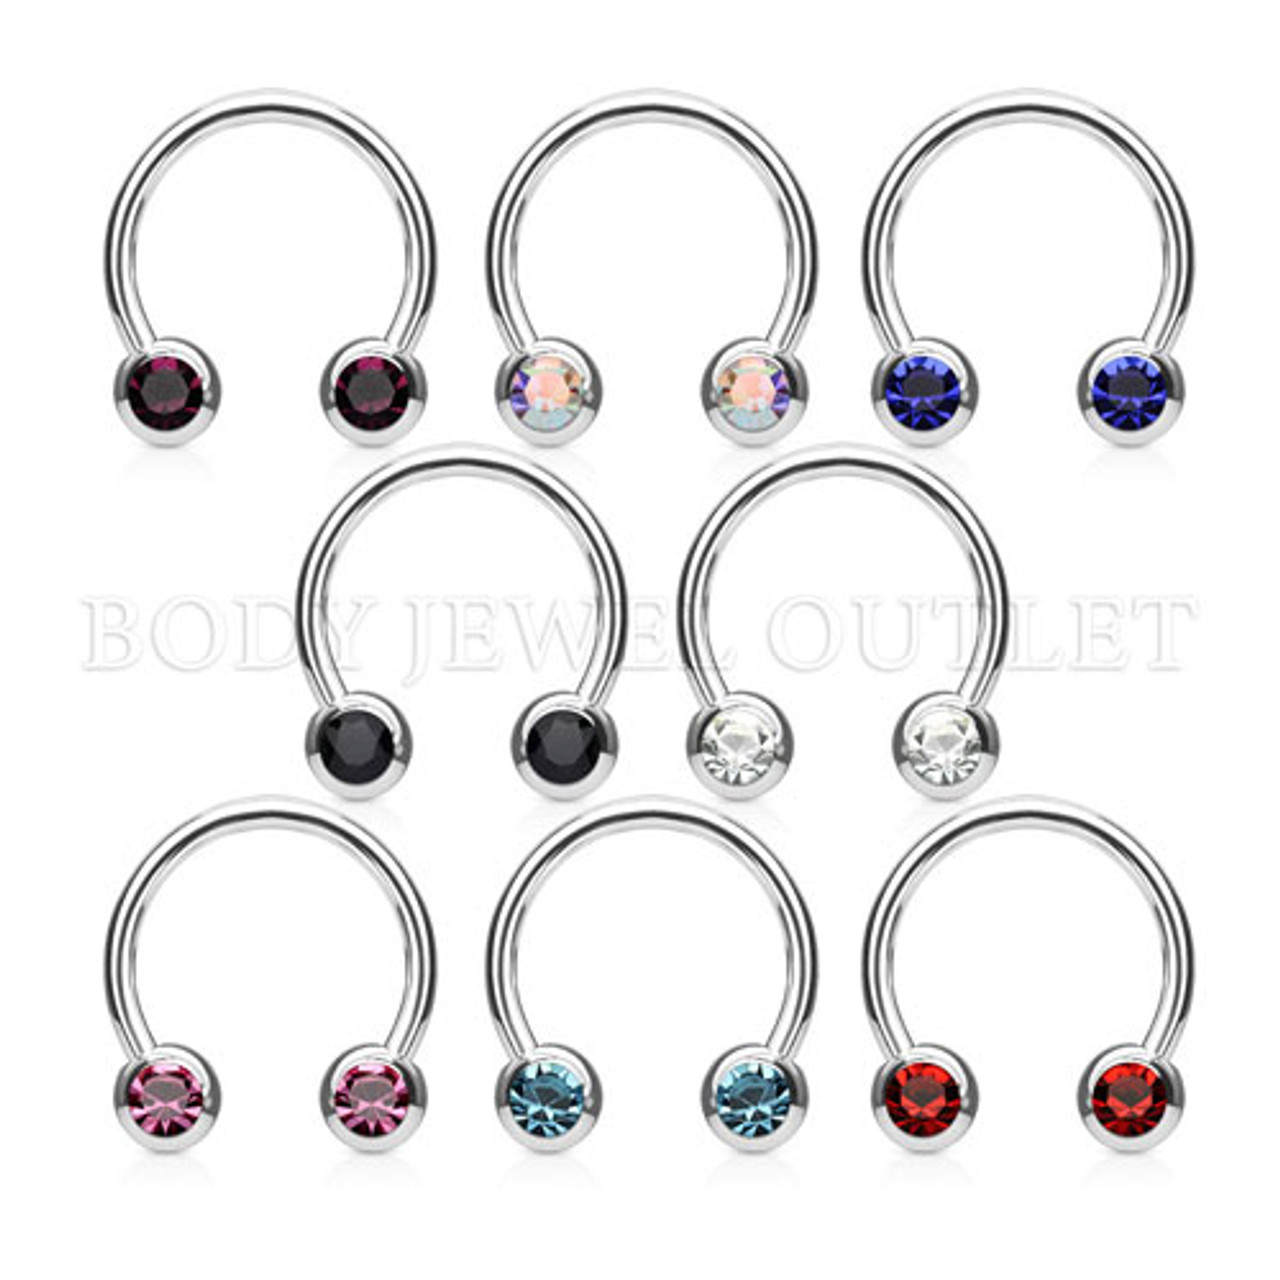 AB (Rainbow) Front Facing Gem - Steel Balls 5mm - 316L Surgical Steel Circular Barbell/Nipple Piercing - 14 Gauge (2 Pieces)